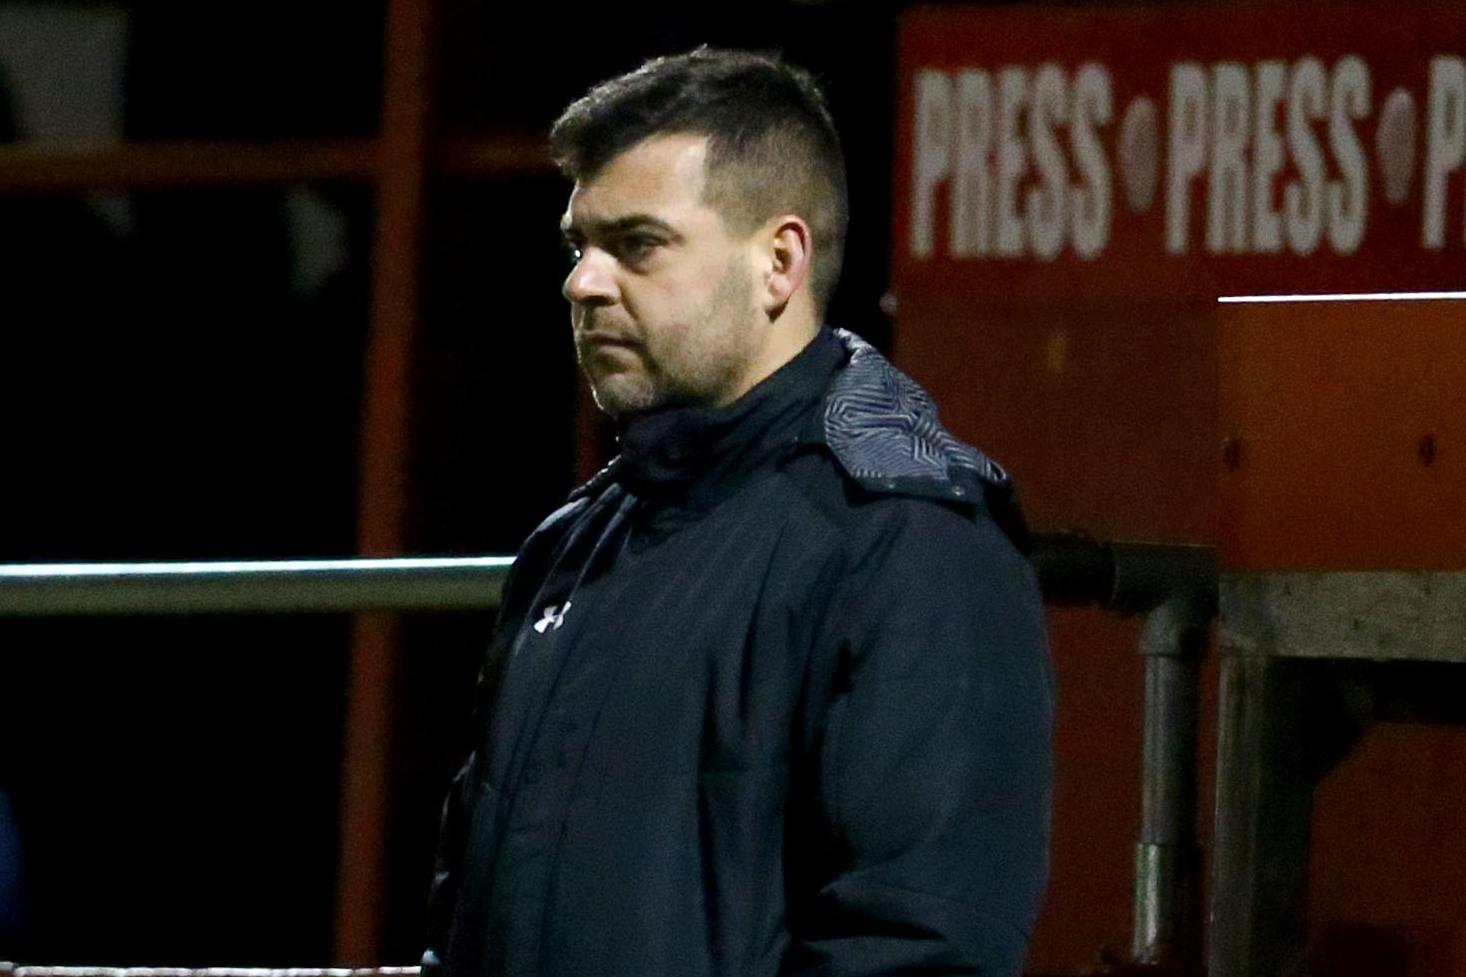 Horseman: Saints B missed an opportunity against Brighton